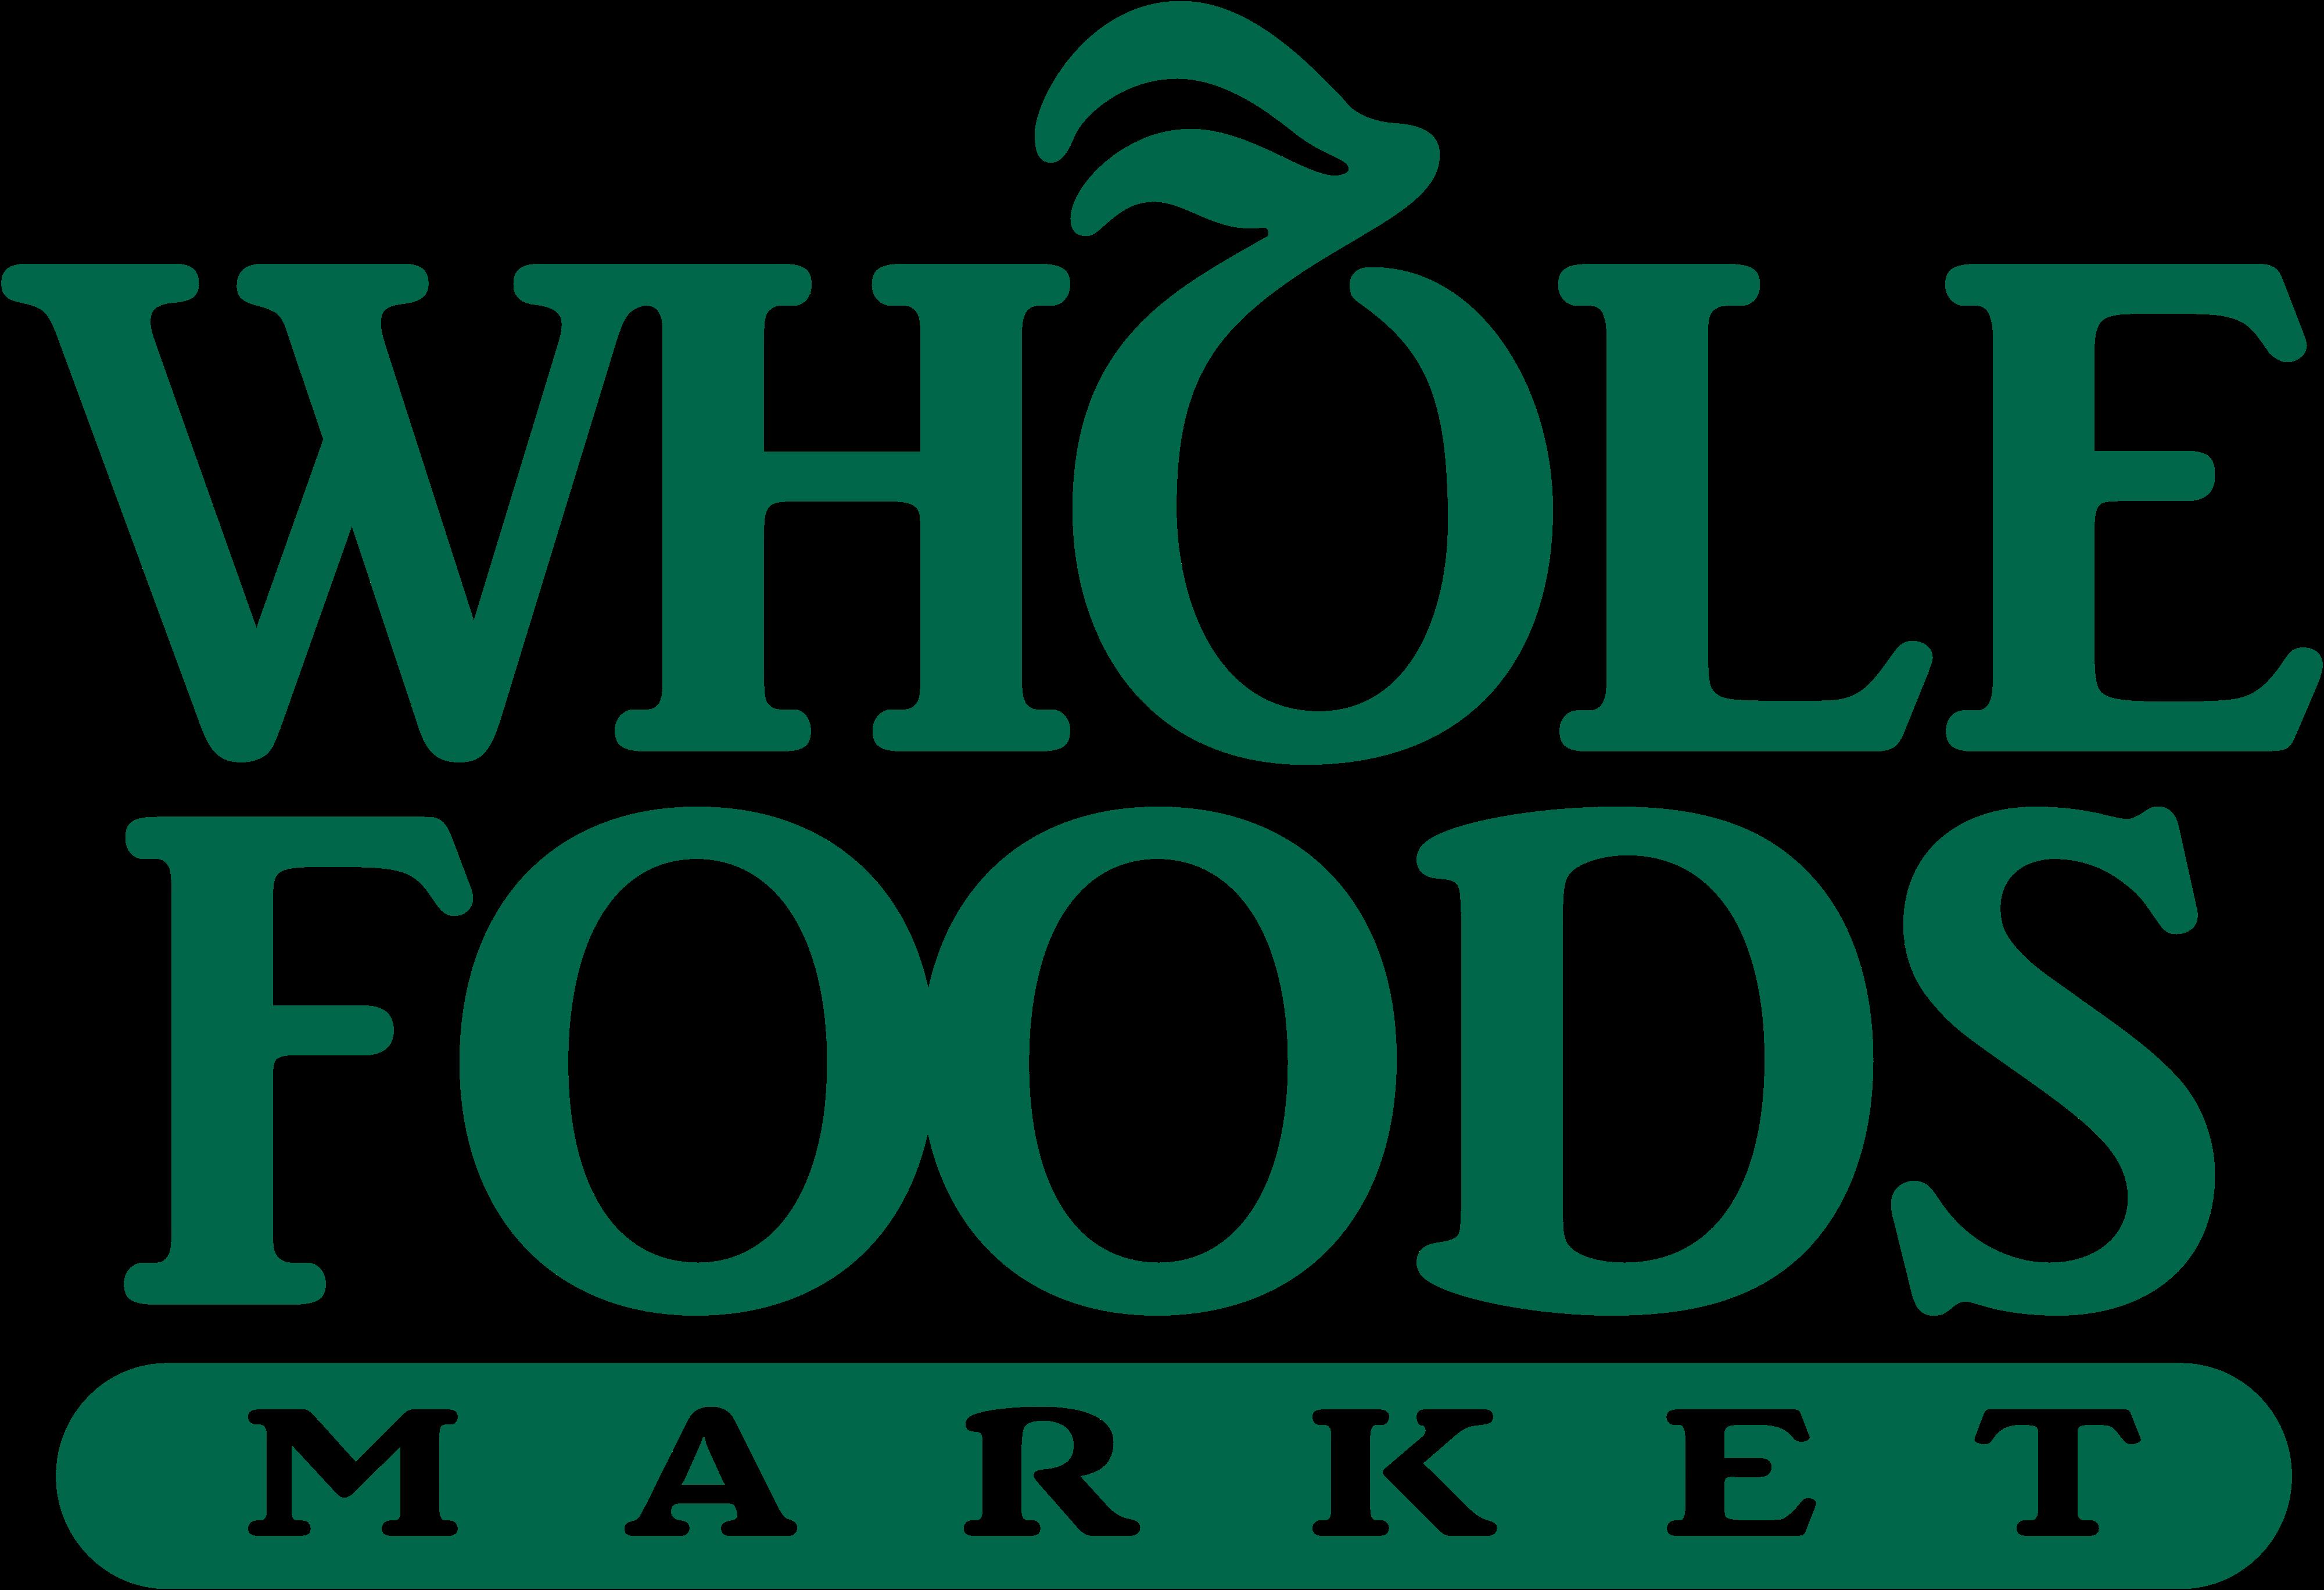 Télécharger photo whole foods logo png